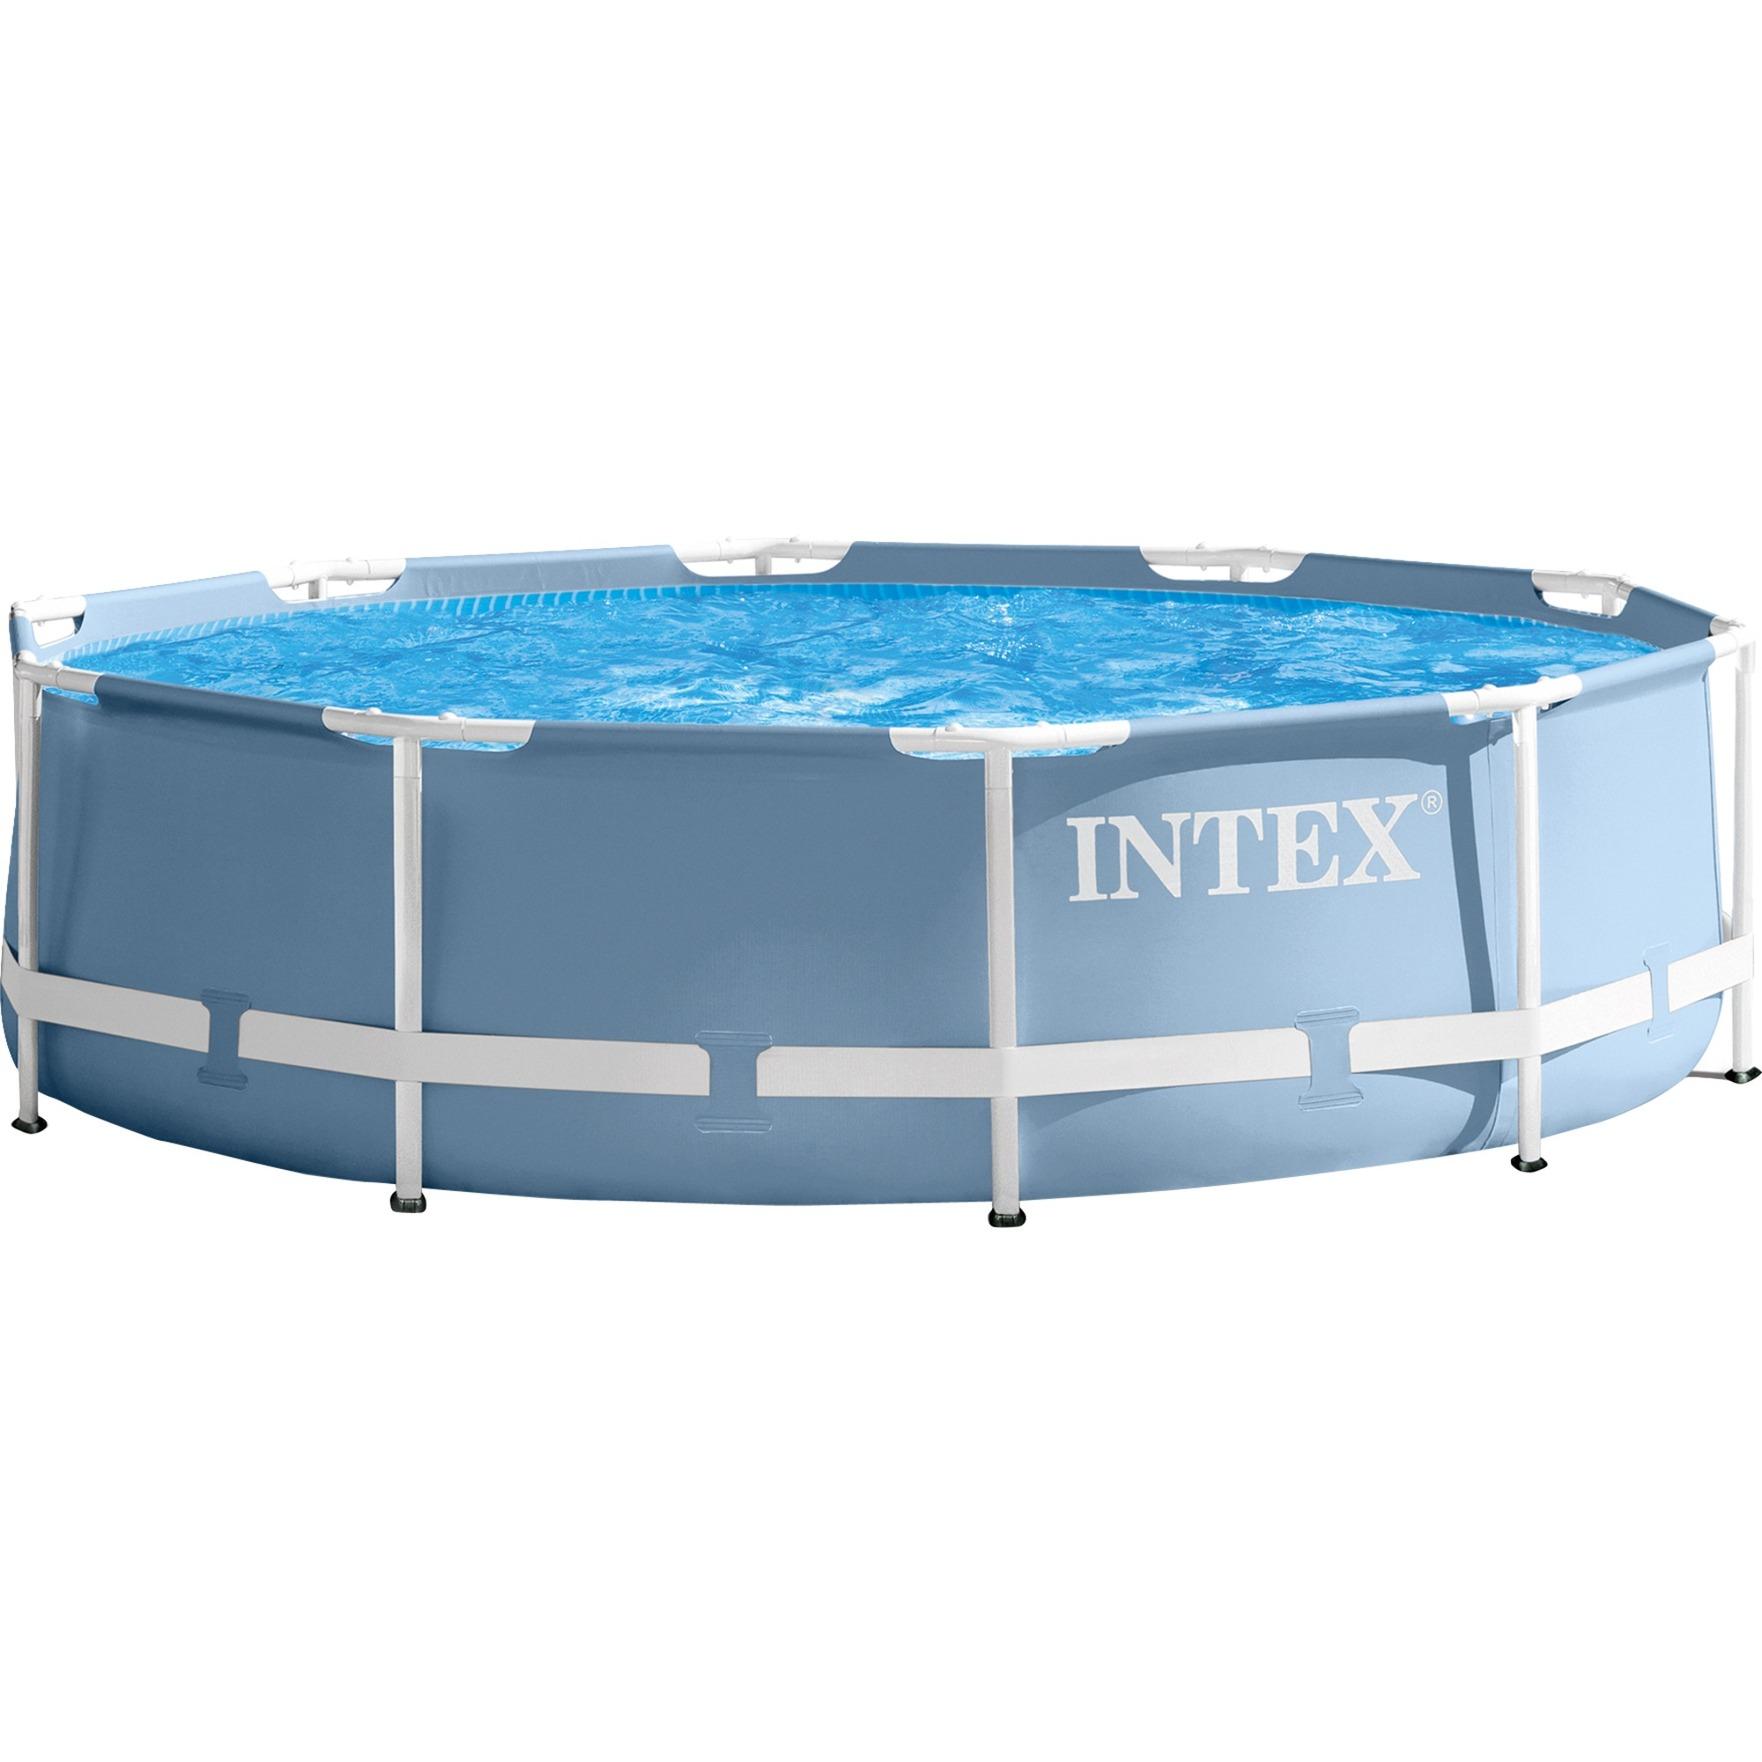 28712-framed-pool-round-pool-6503l-blaa-hvid-swimmingpool-til-over-jorden-swimming-pool